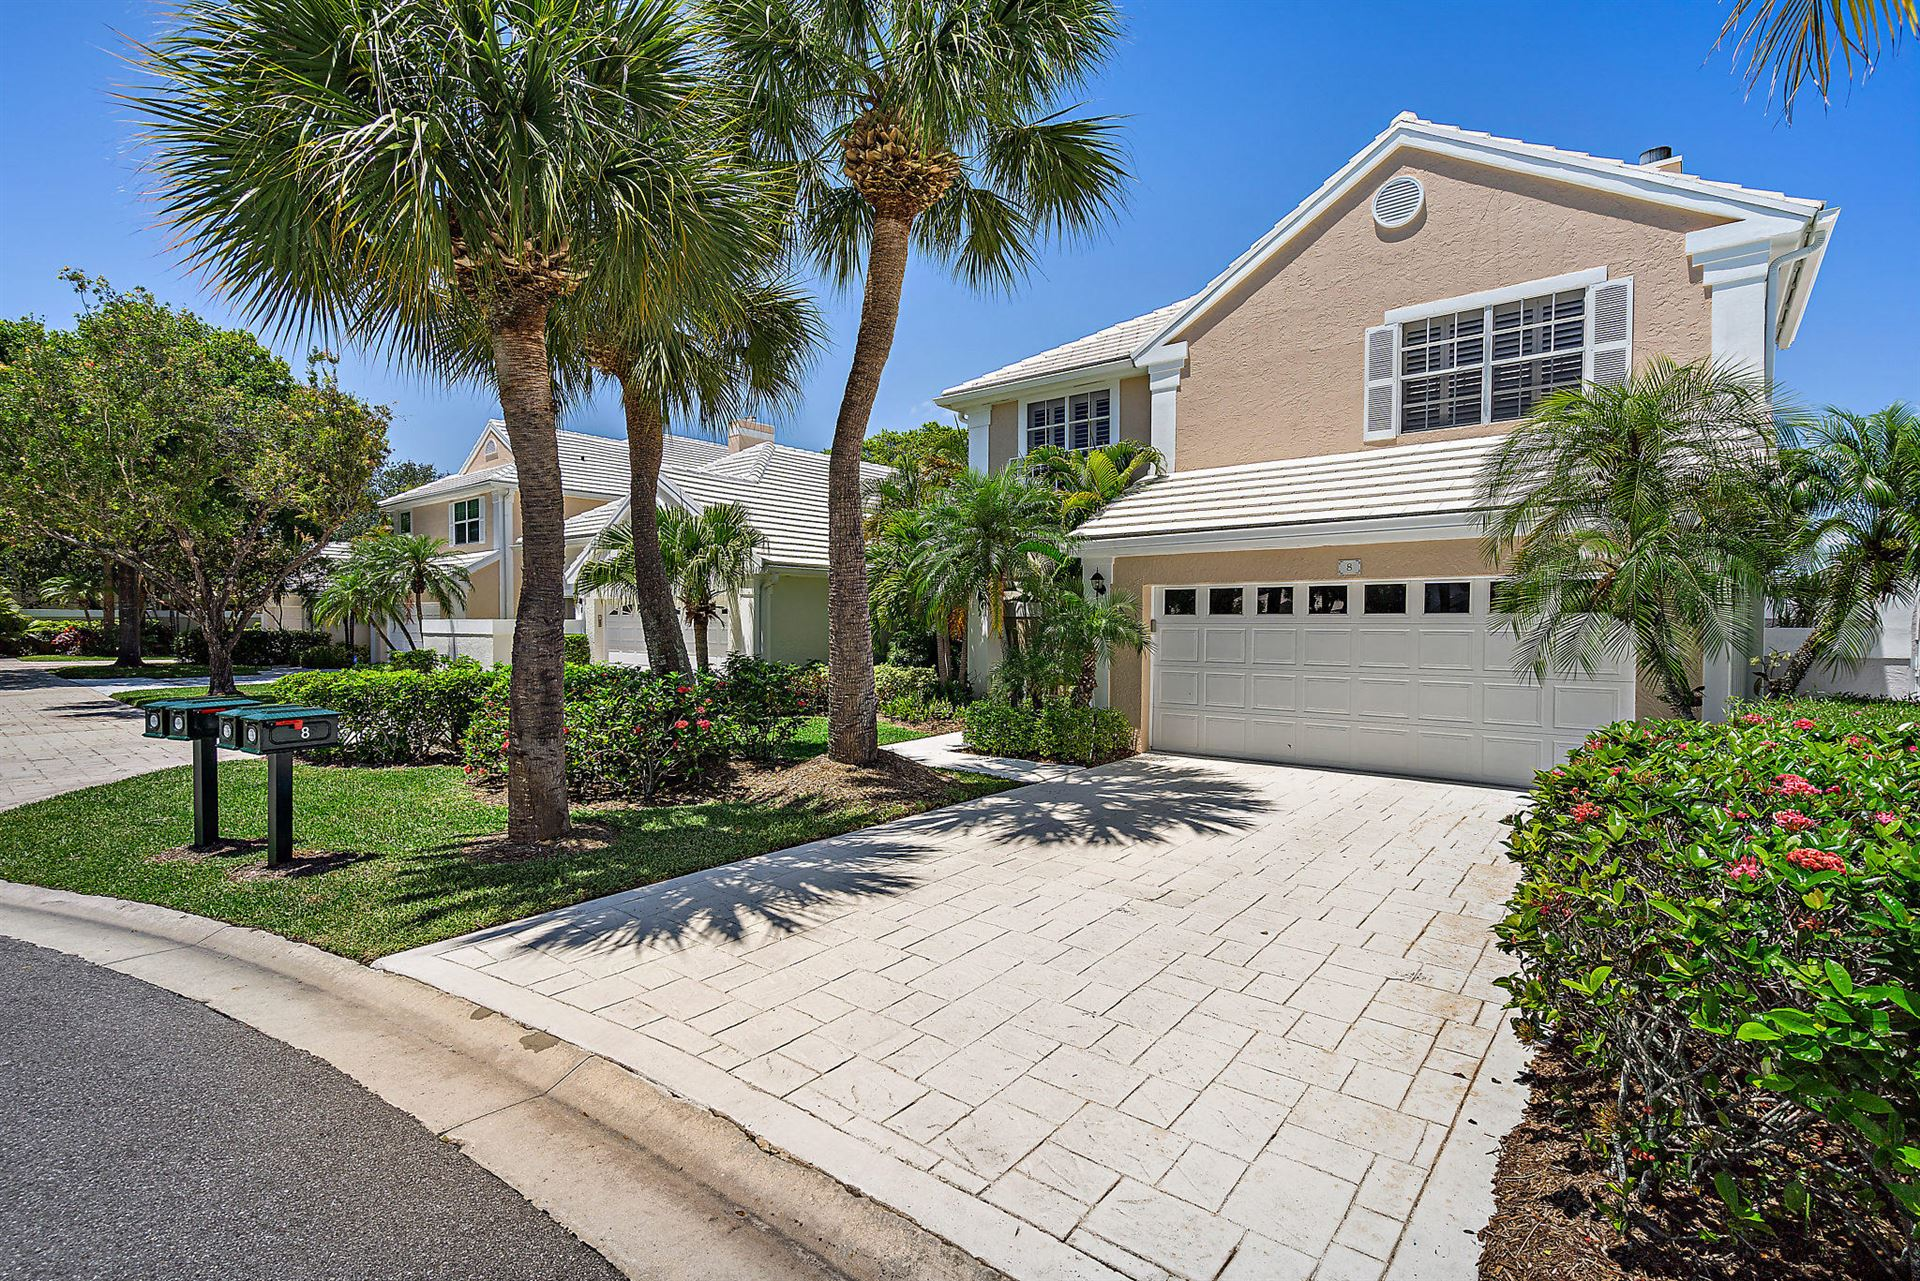 Photo of 8 Windsor Lane, Palm Beach Gardens, FL 33418 (MLS # RX-10619624)